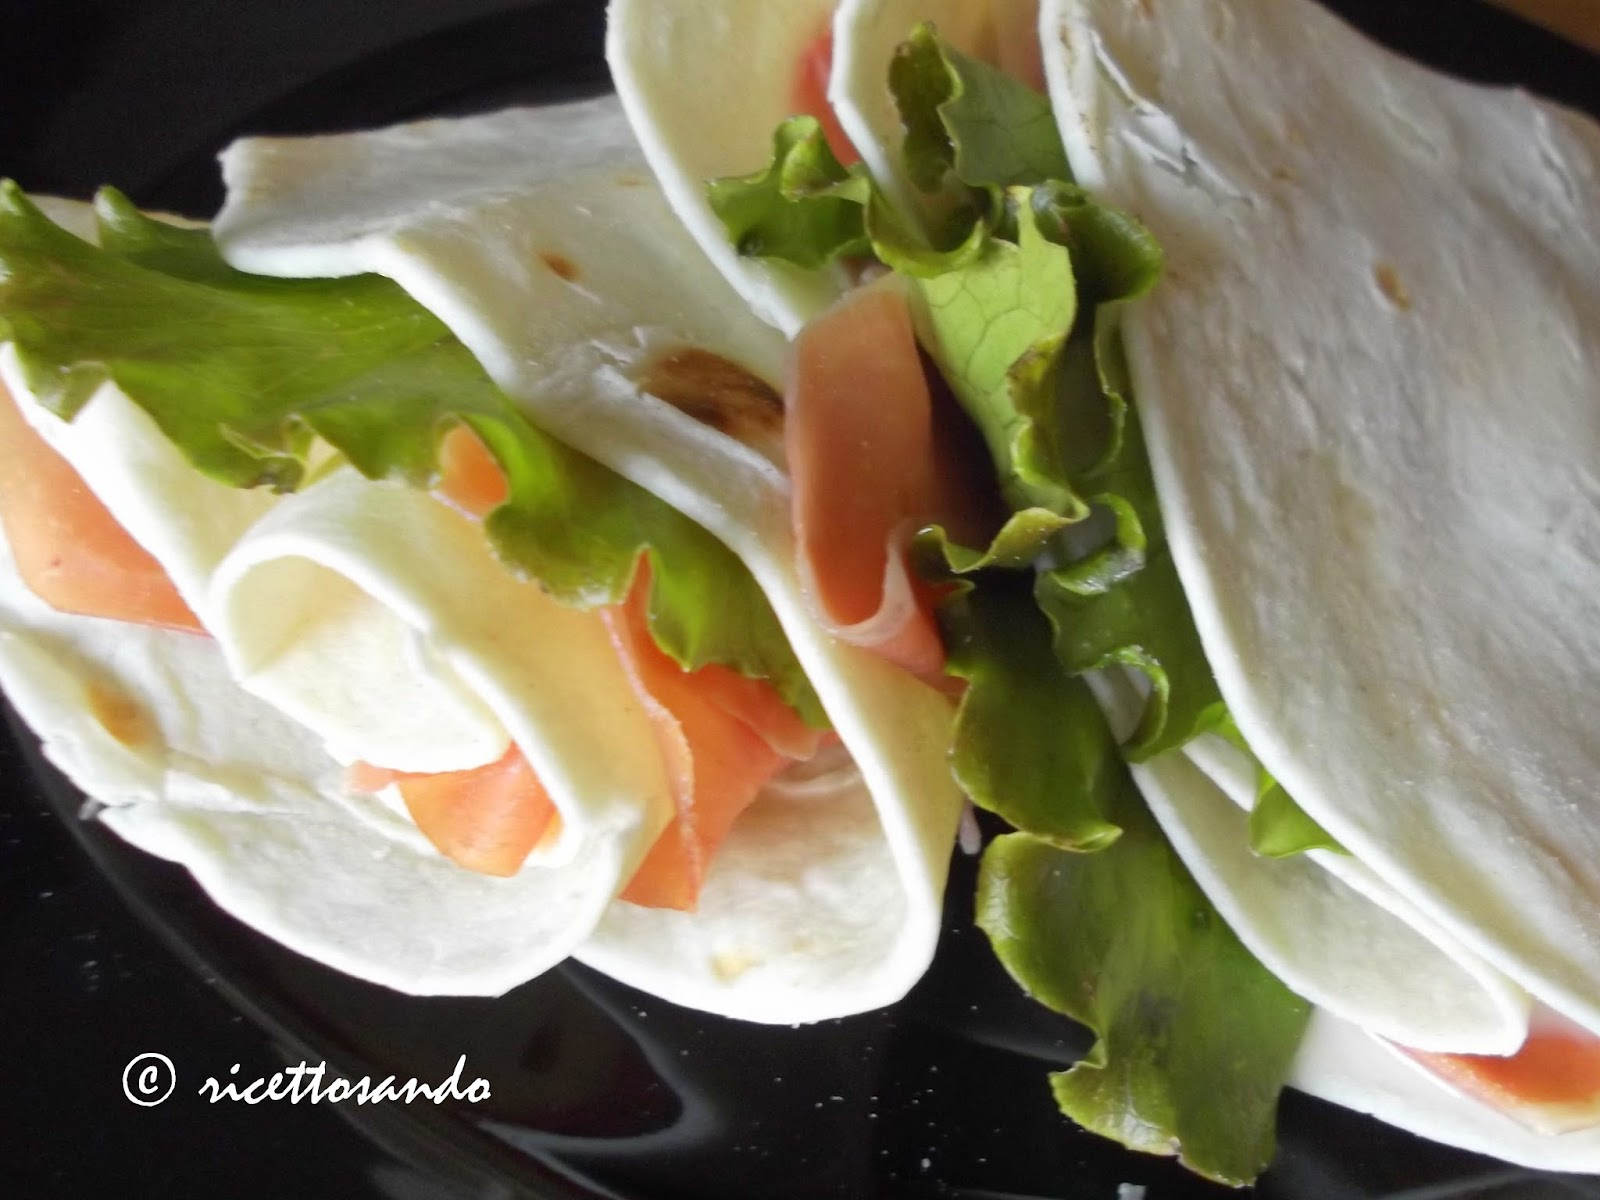 piadina ricetta di base fingerfood